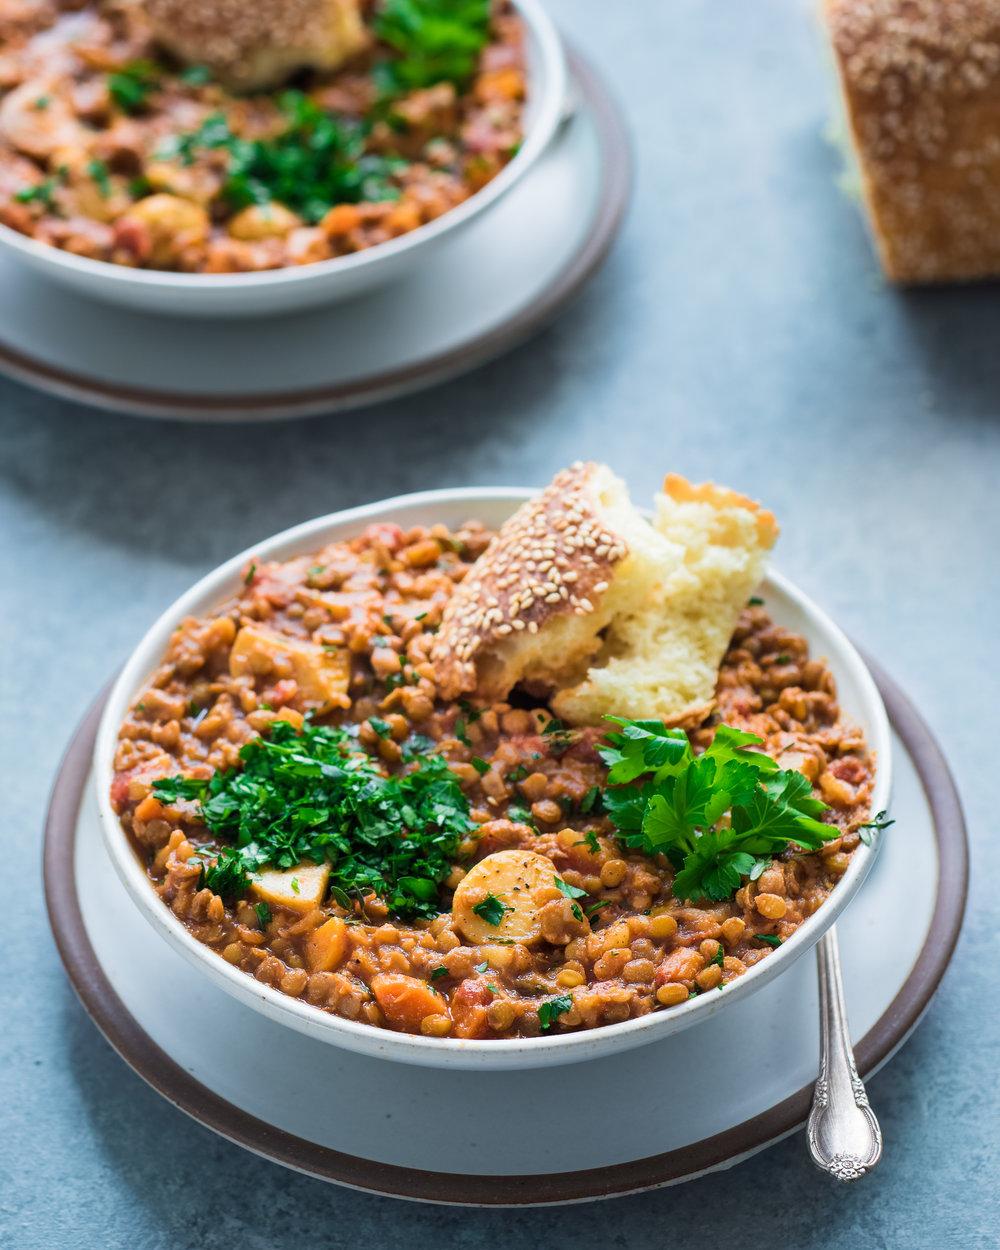 Vegan Instant Pot Meal Prep Ideas